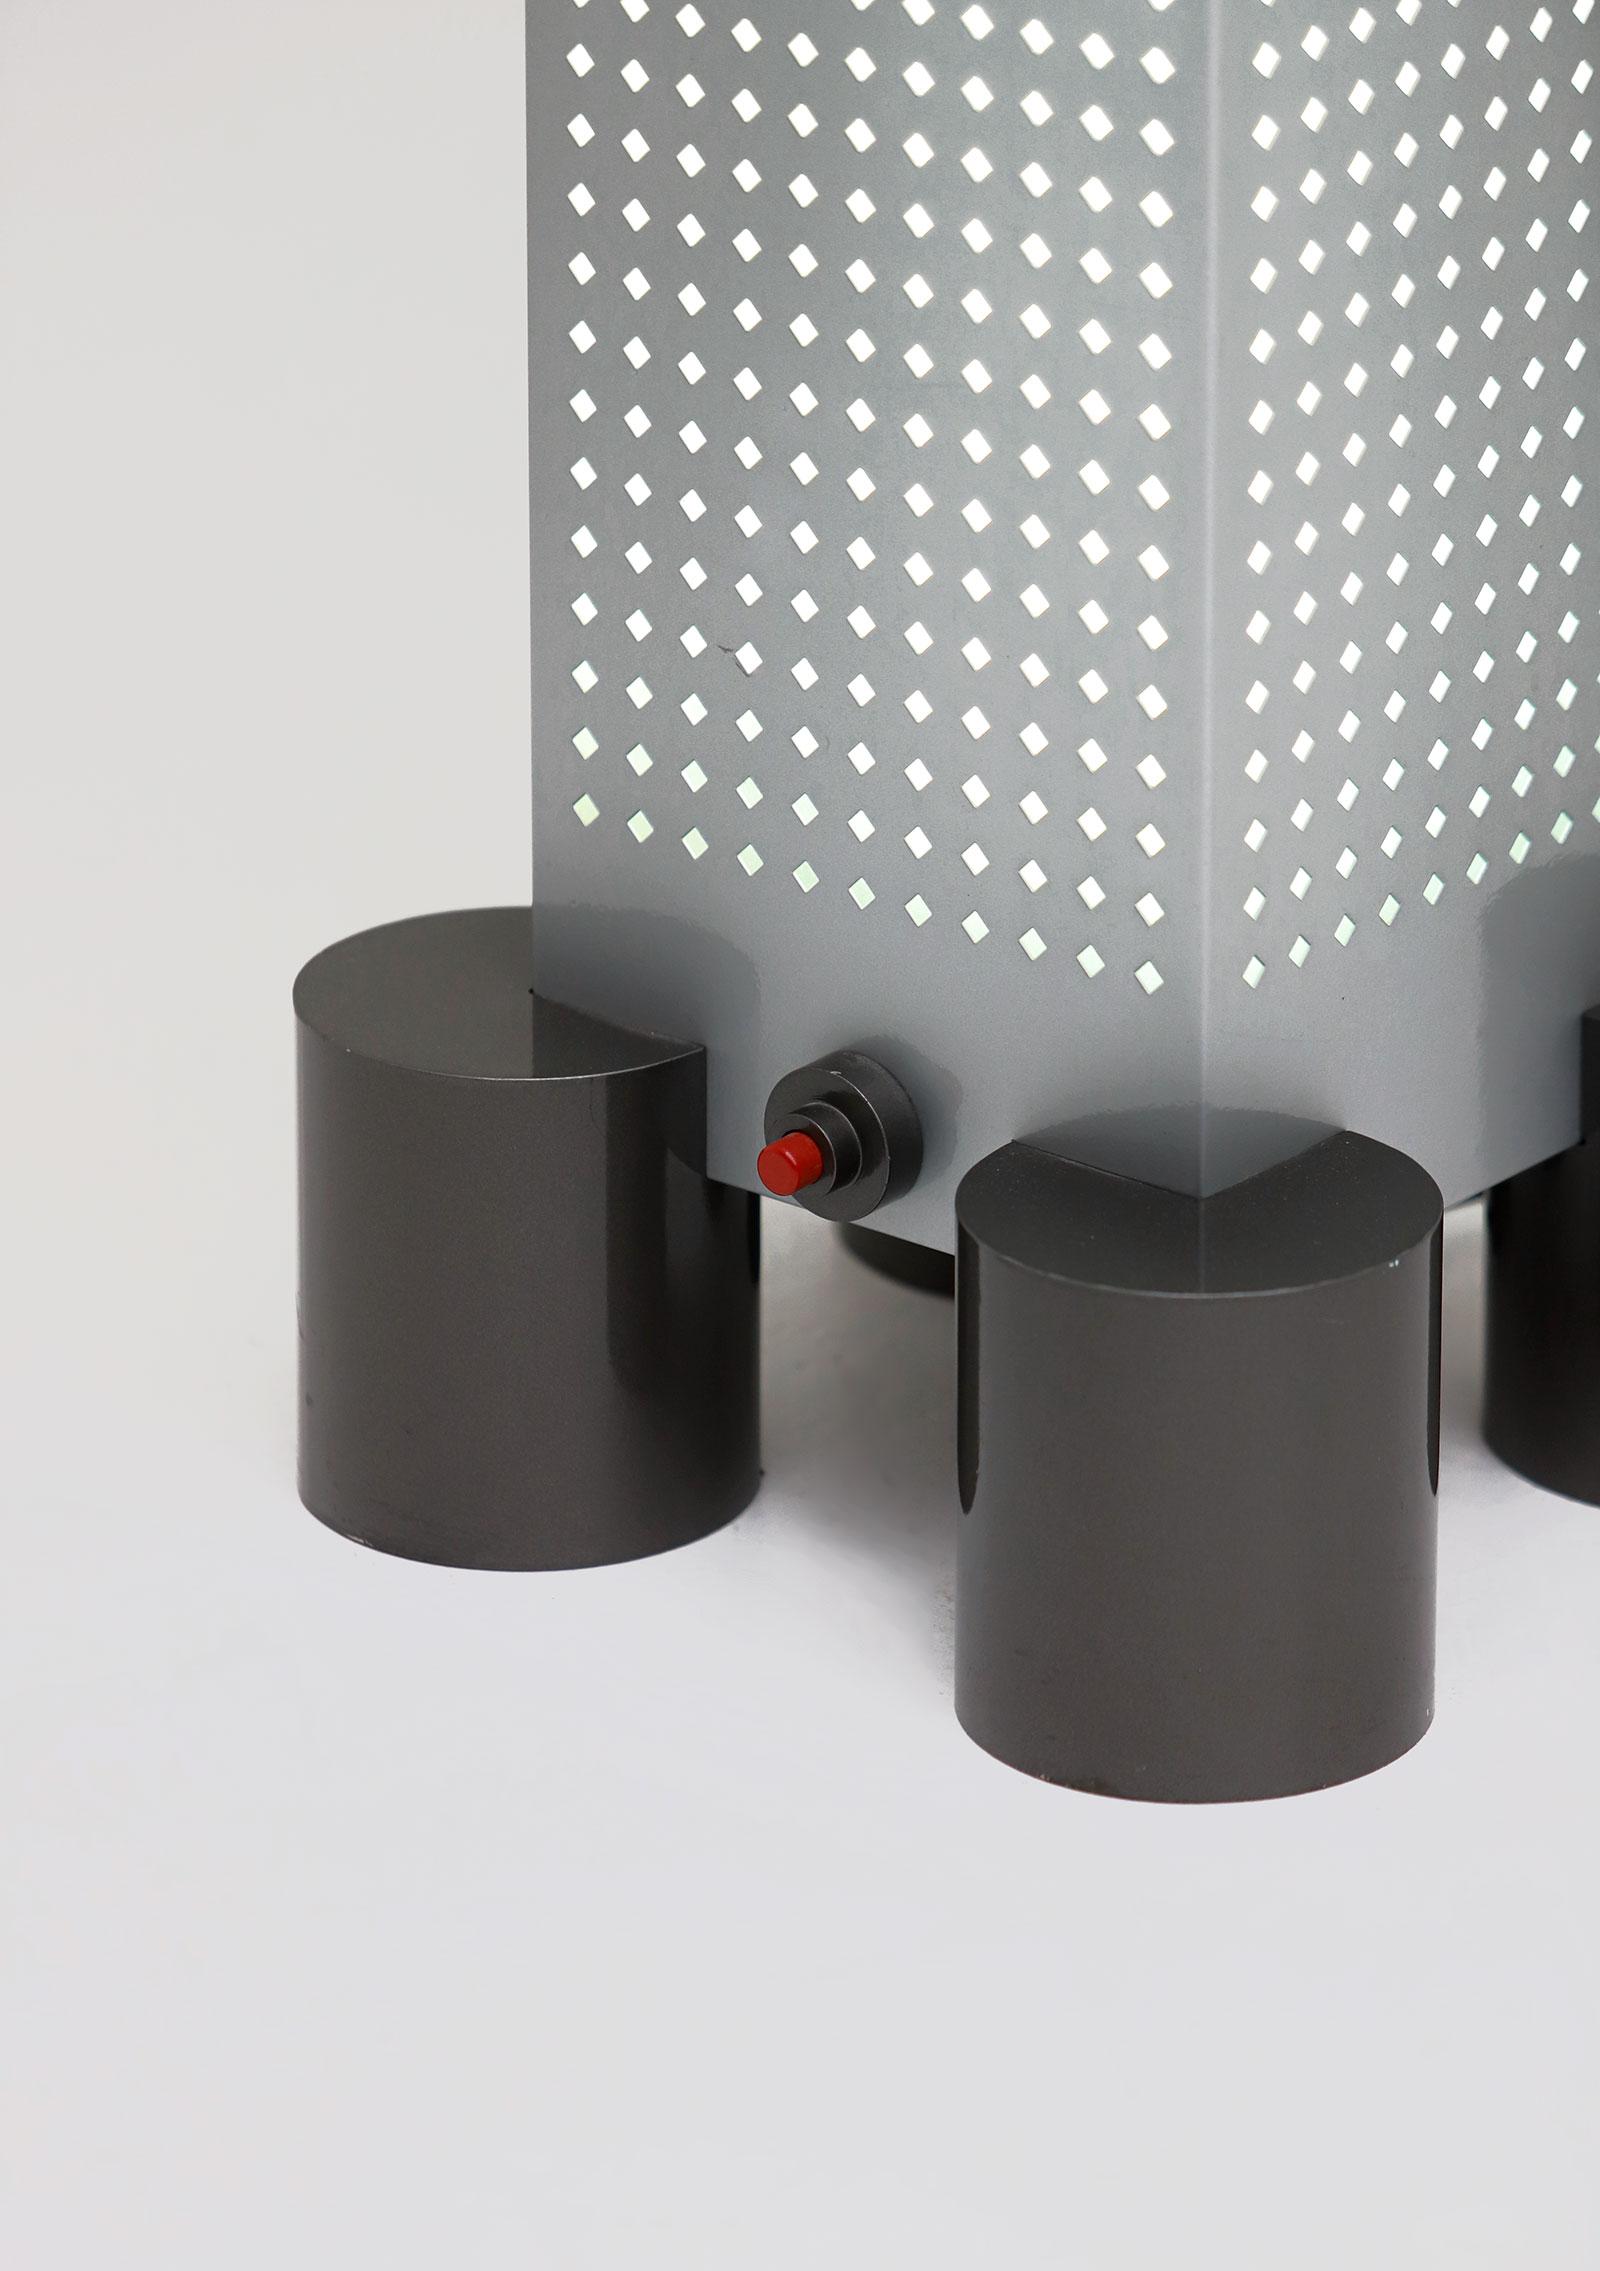 Matteo Thun & Andrea Lera wwf Tower Bieffeplast image 3